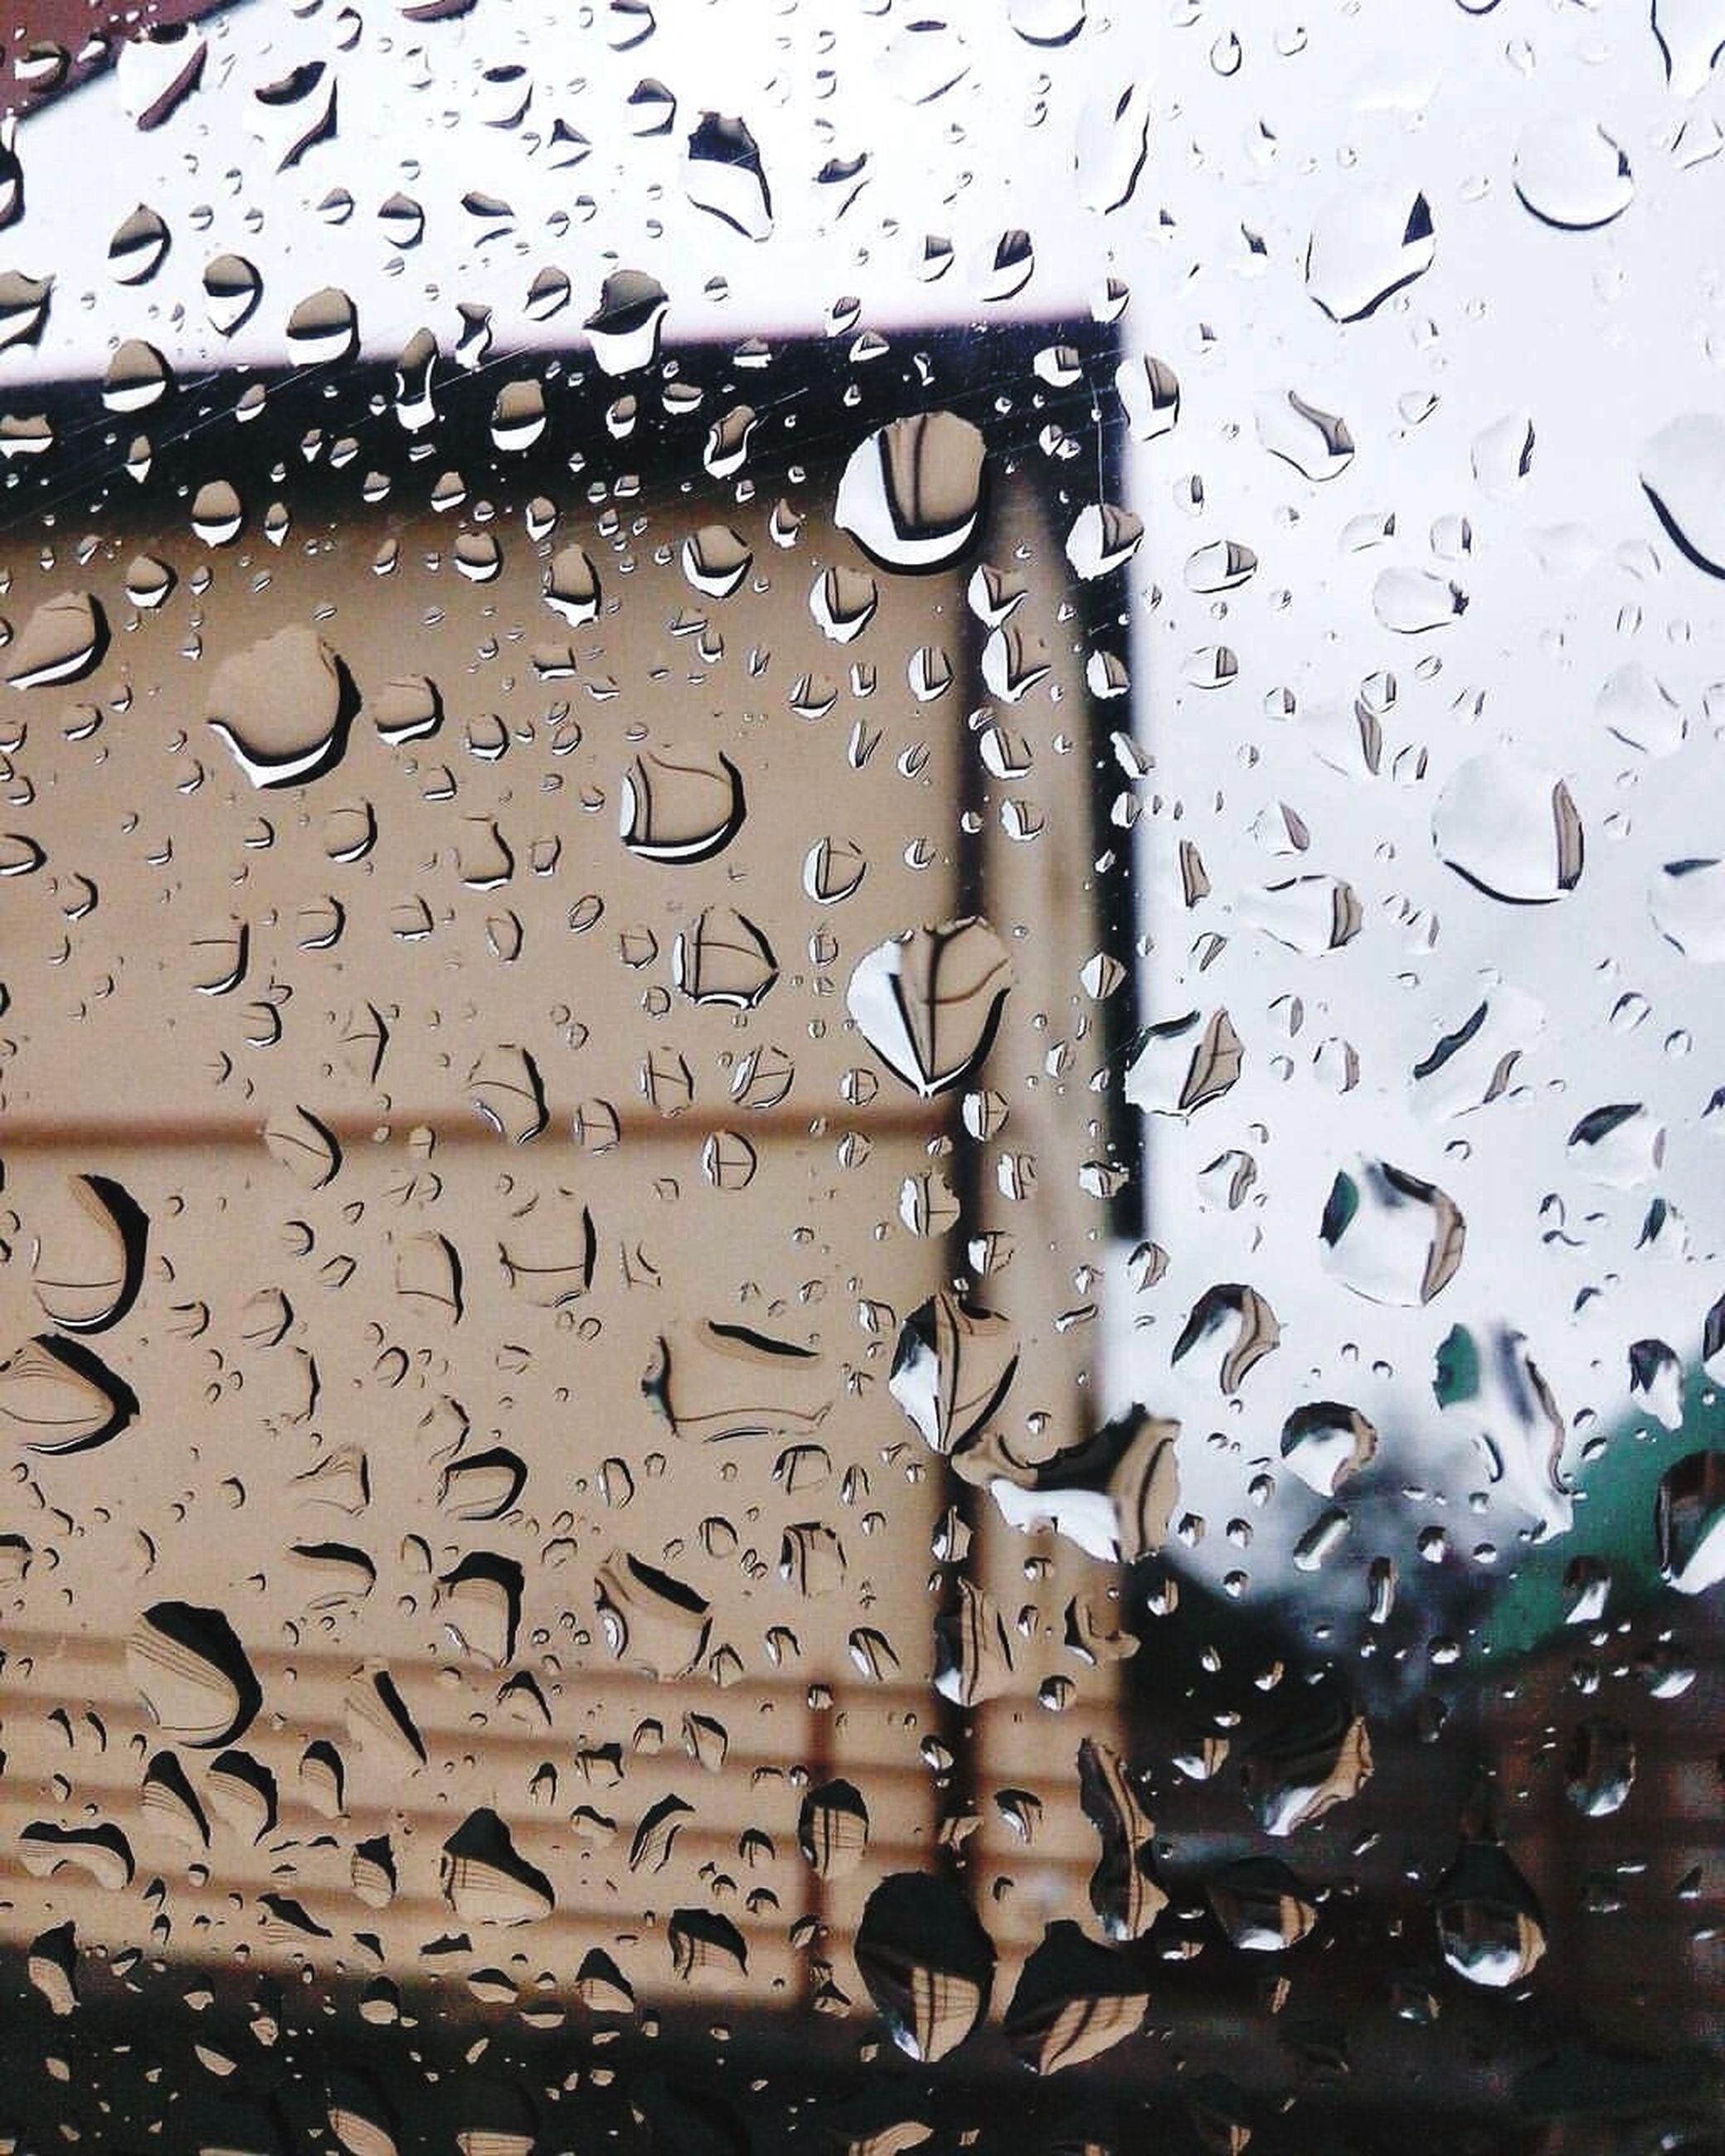 rain, wet, drop, window, raindrop, weather, rainy season, vehicle interior, water, land vehicle, full frame, car interior, car, no people, day, backgrounds, close-up, indoors, sky